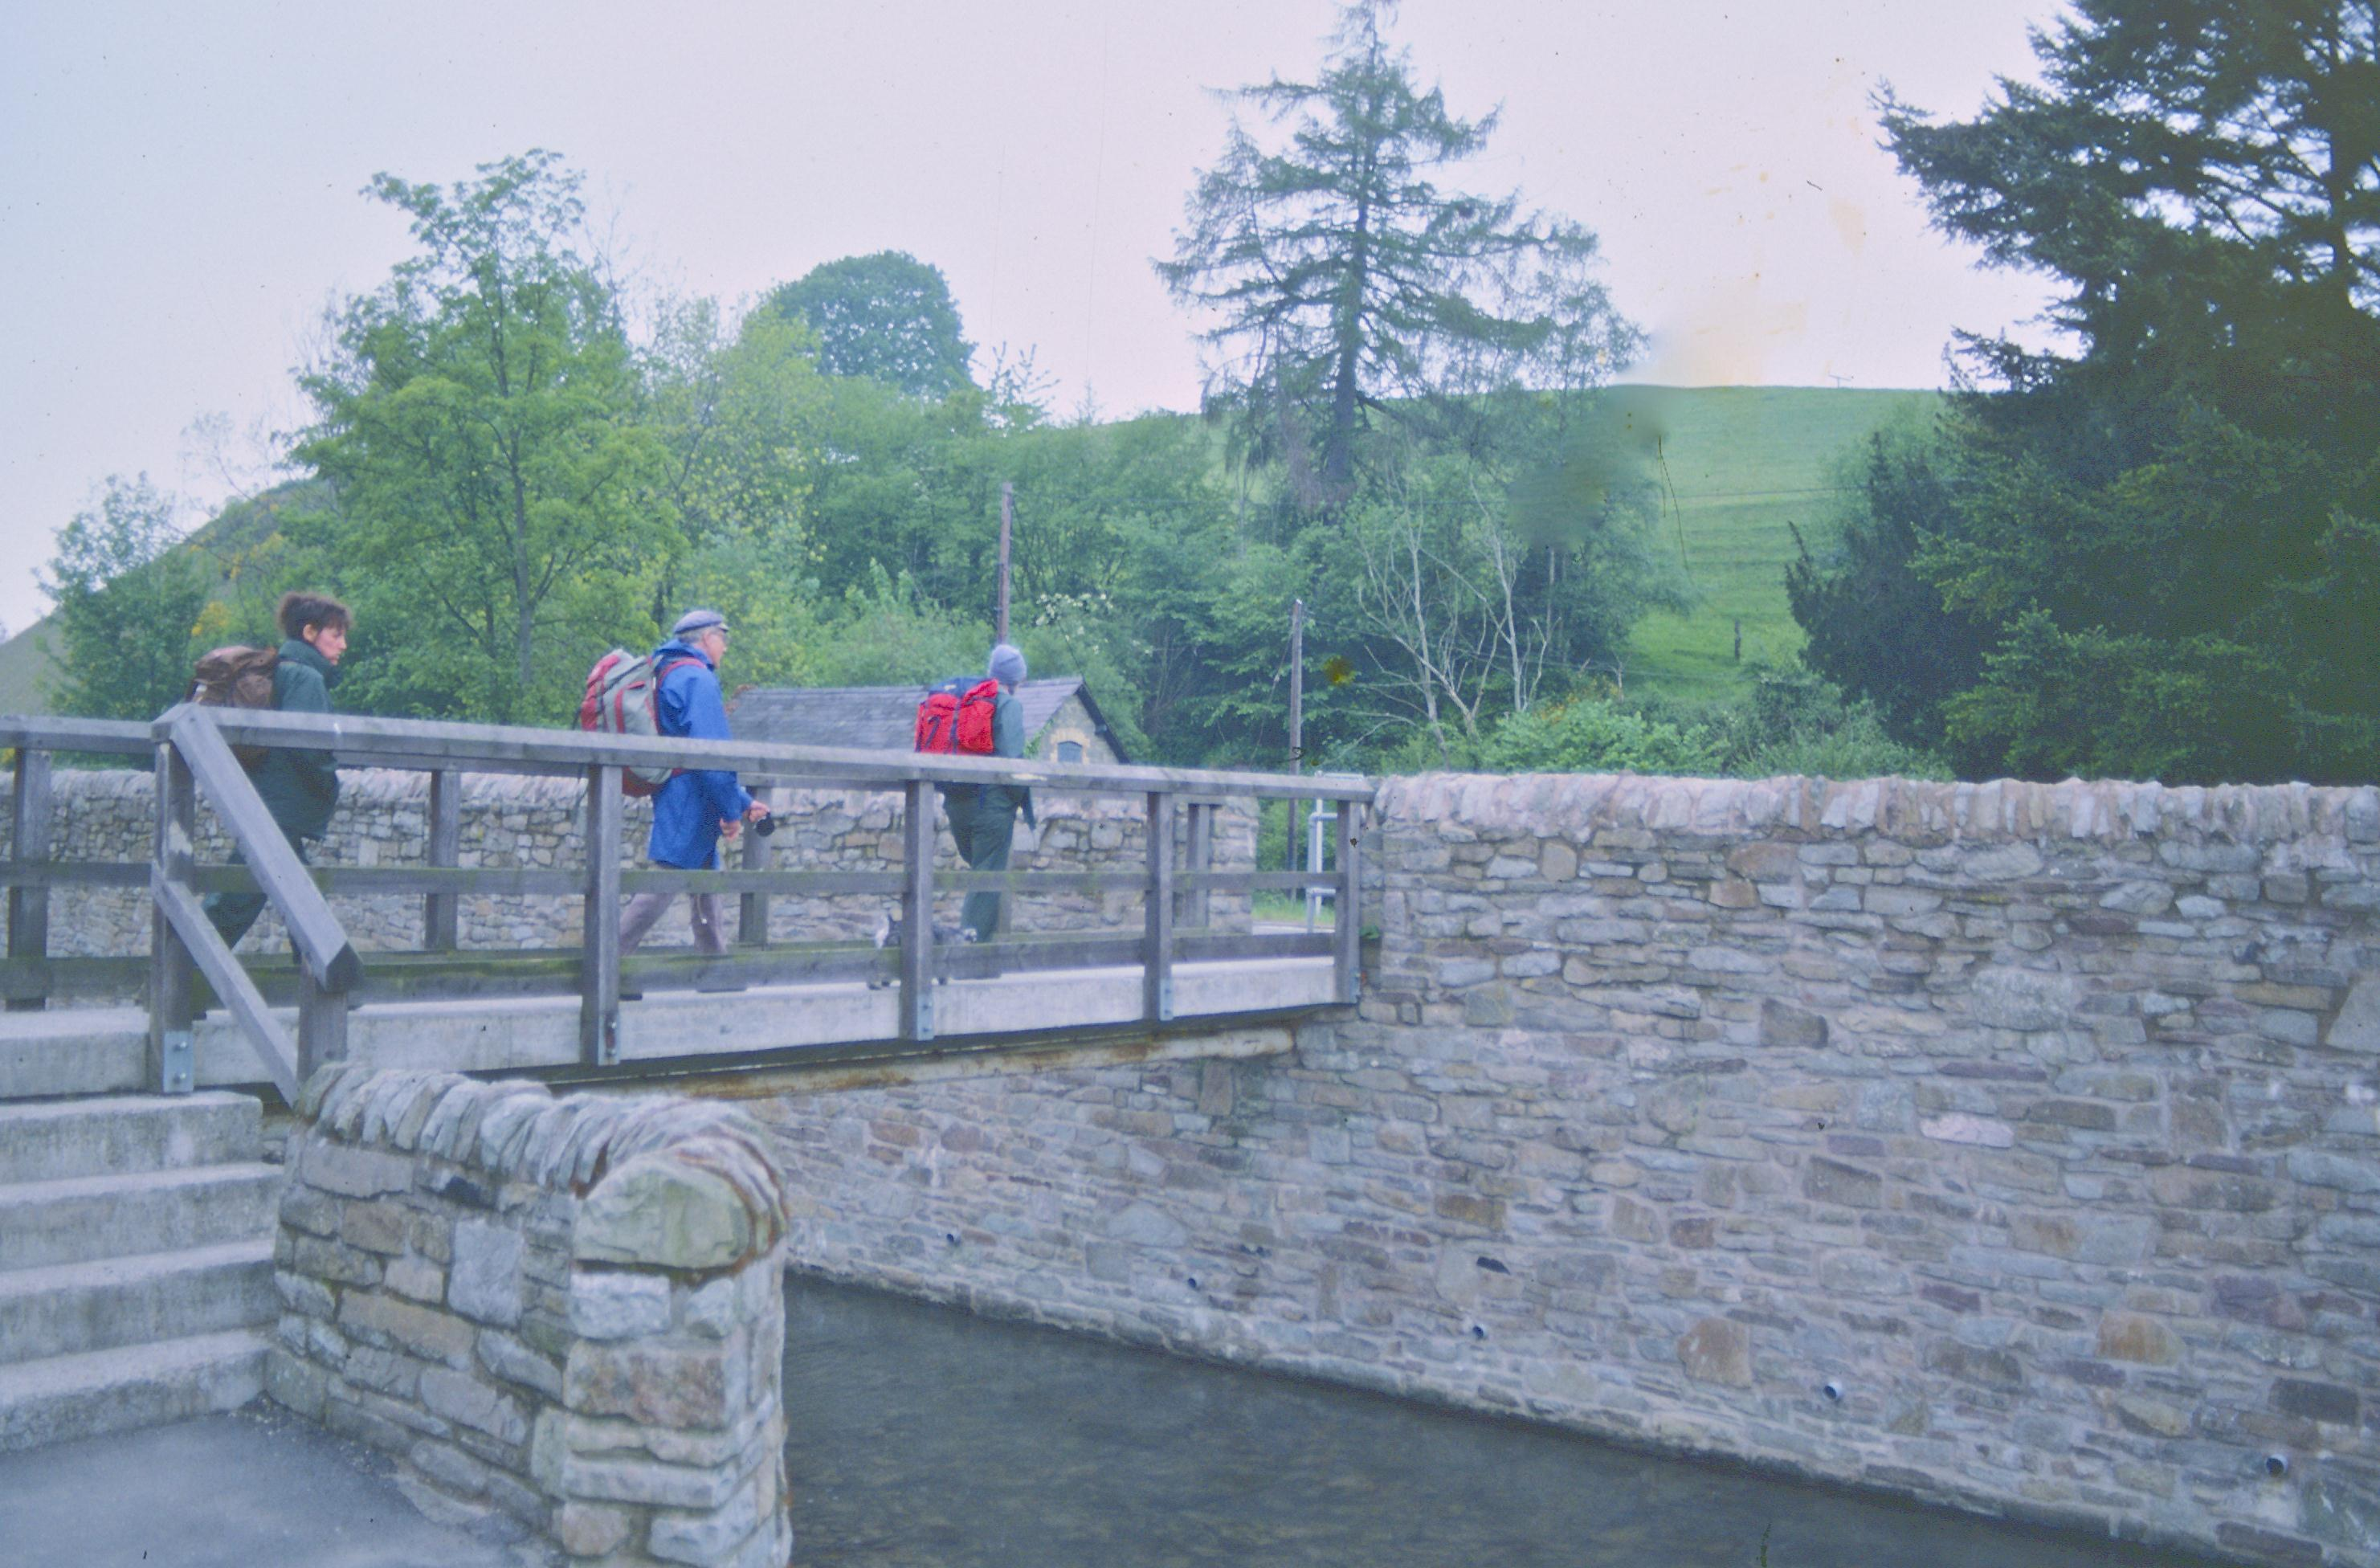 Our party crosses Kington's Back Brook